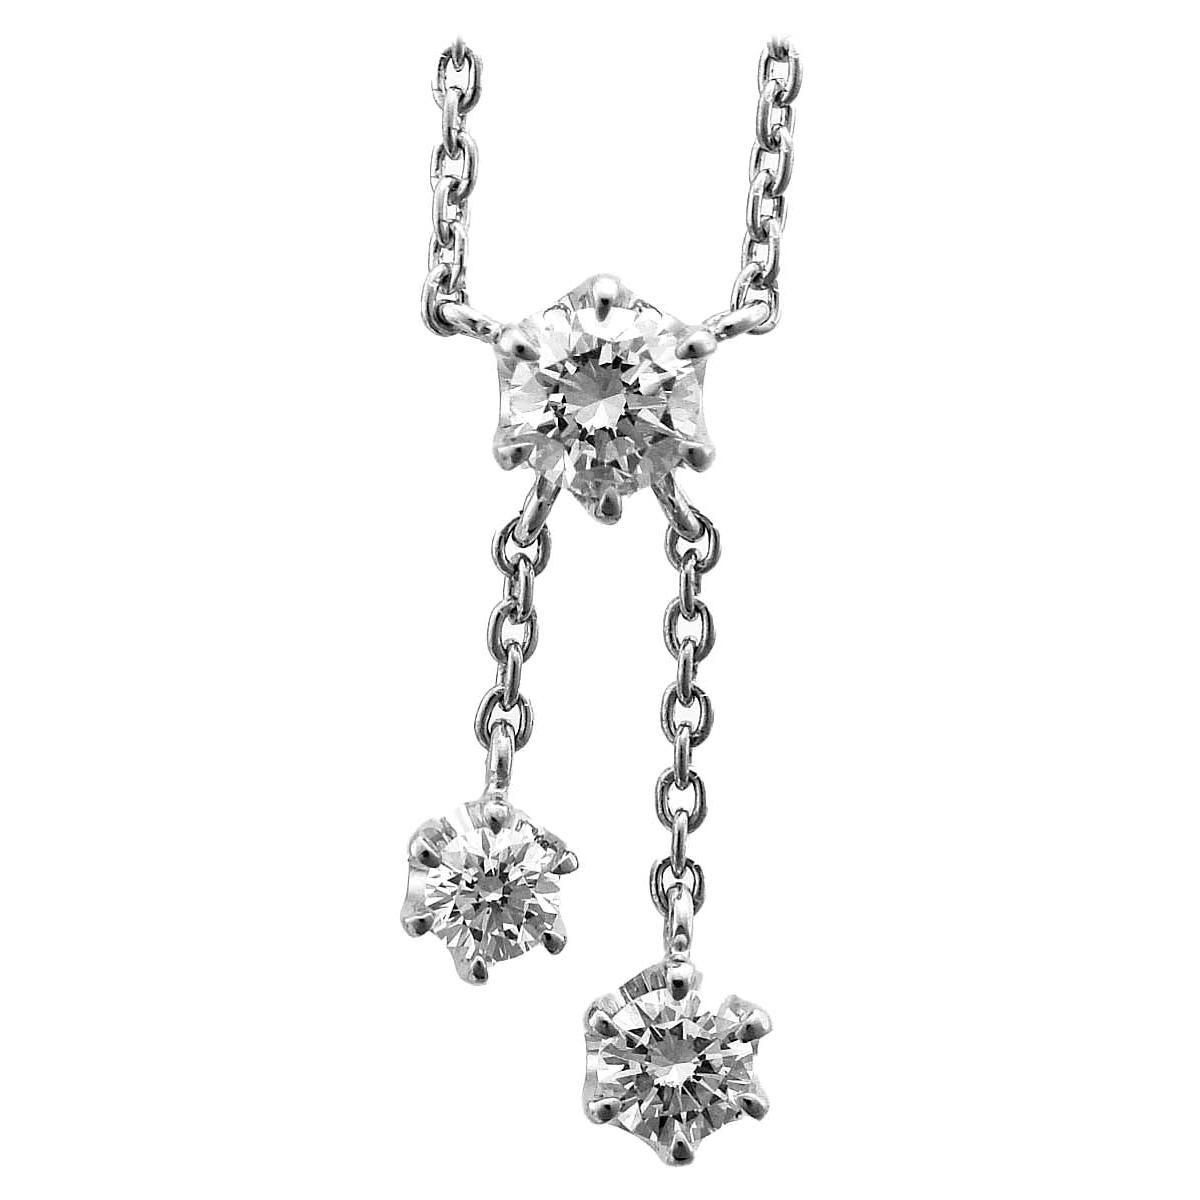 Star Jewelry 0.20 Carat Diamond Platinum Pendant Necklace